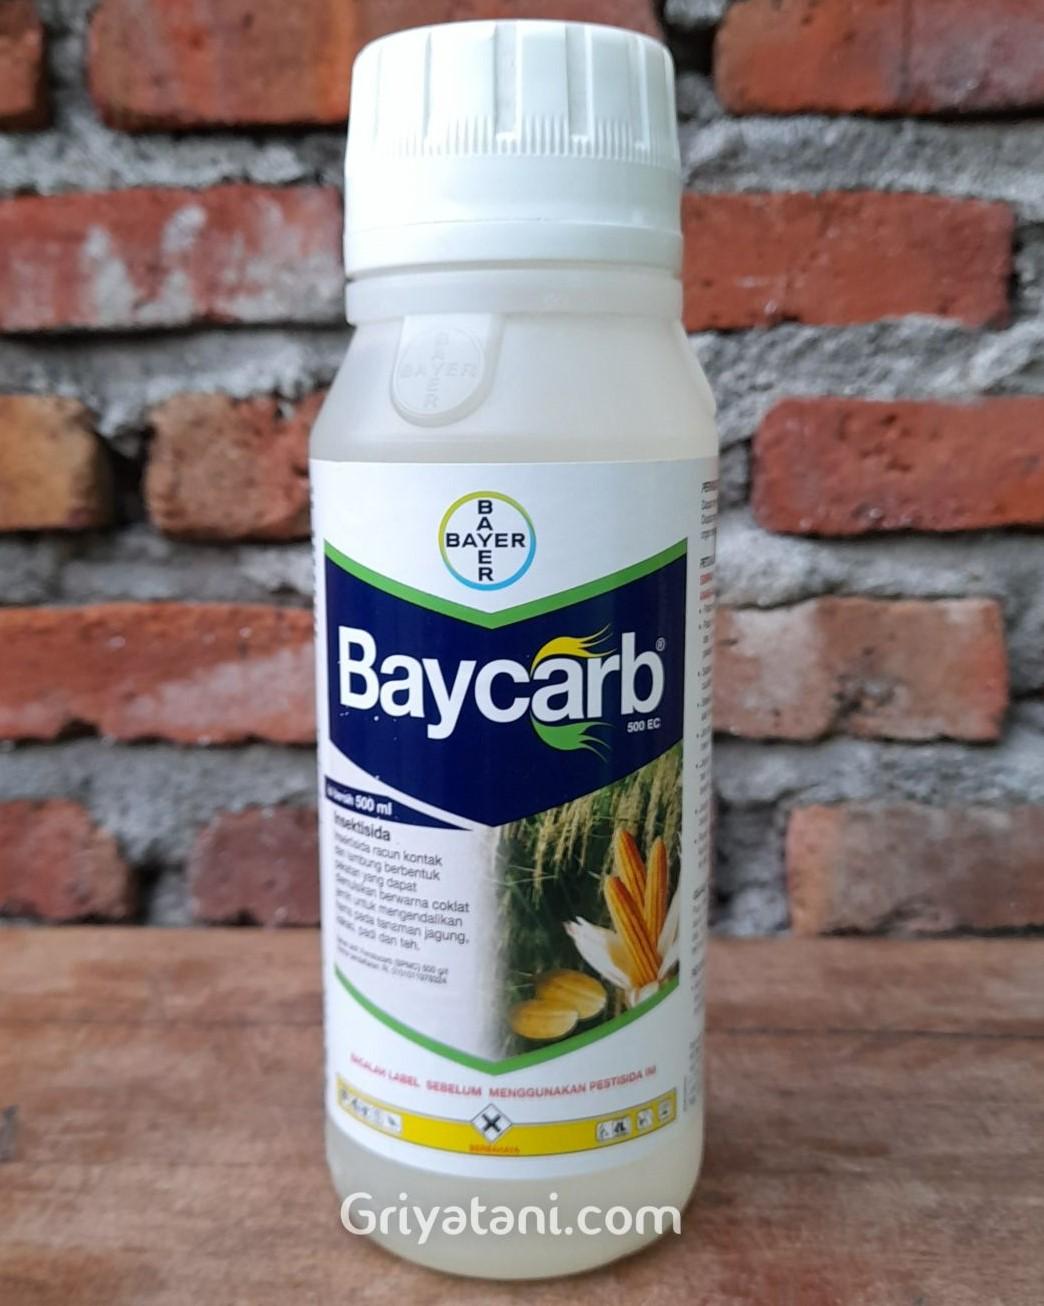 Baycarb